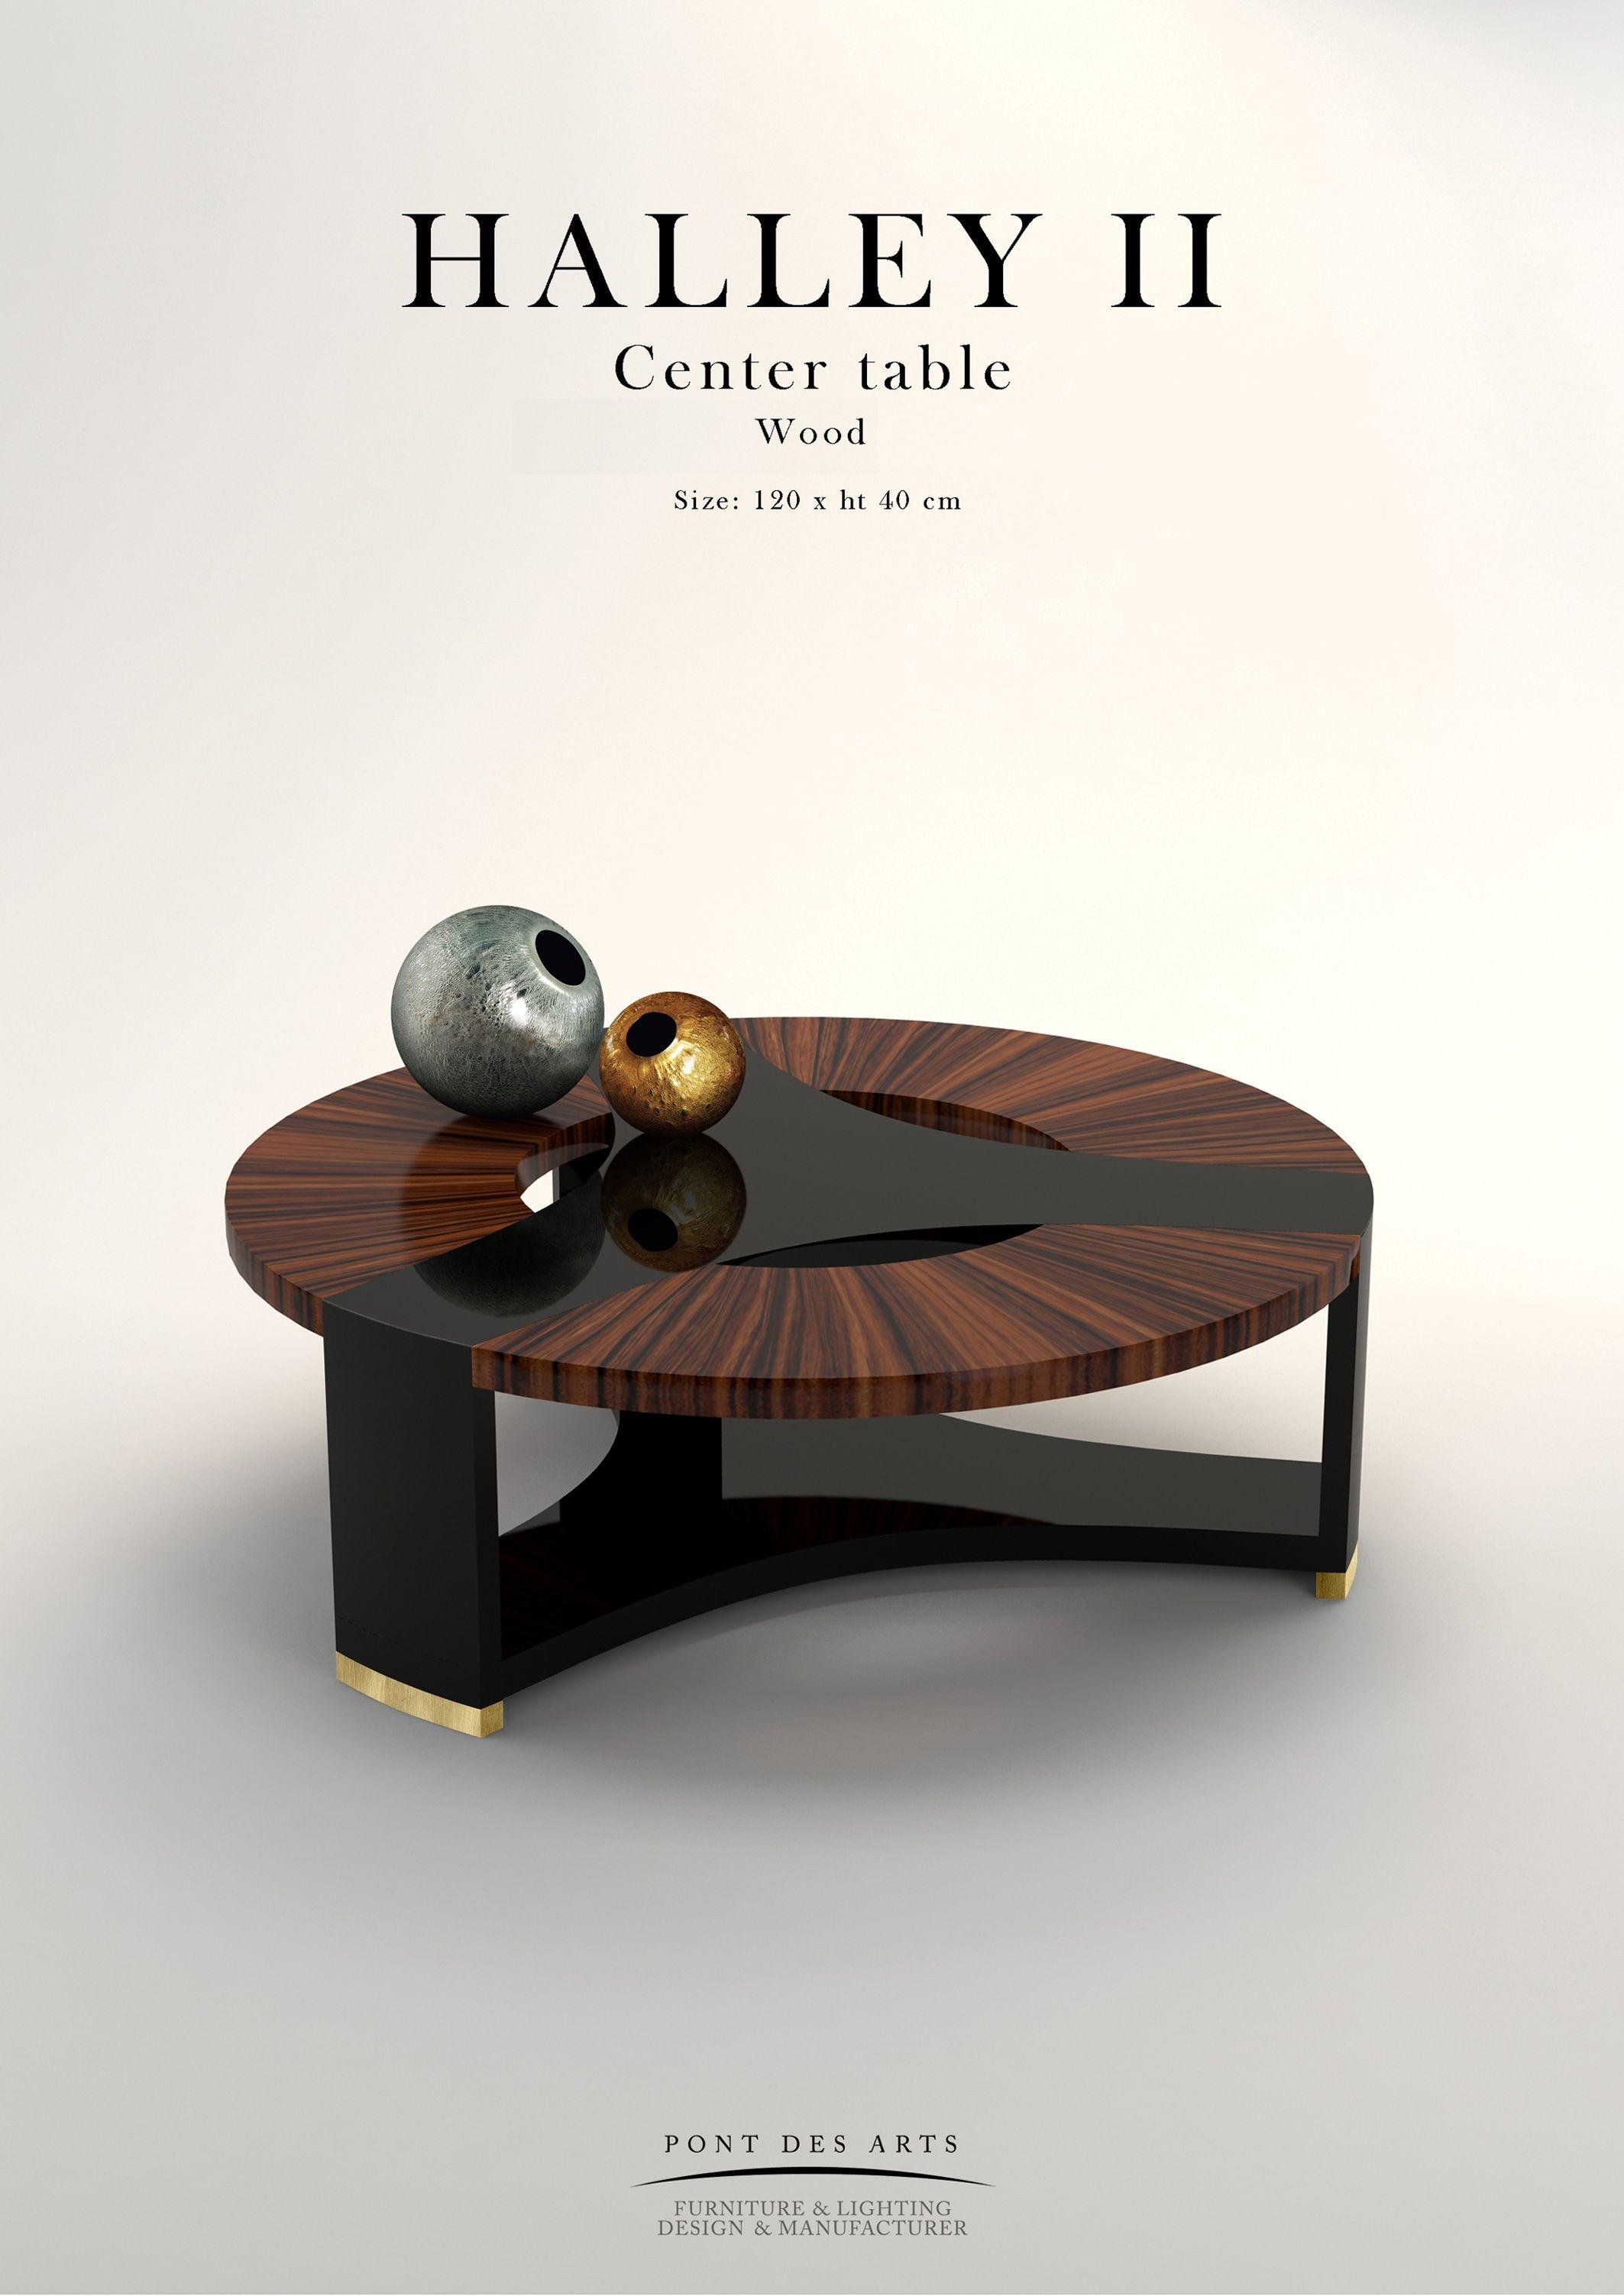 Halley center table pont des arts designer monzer for Mobilia center e confiavel